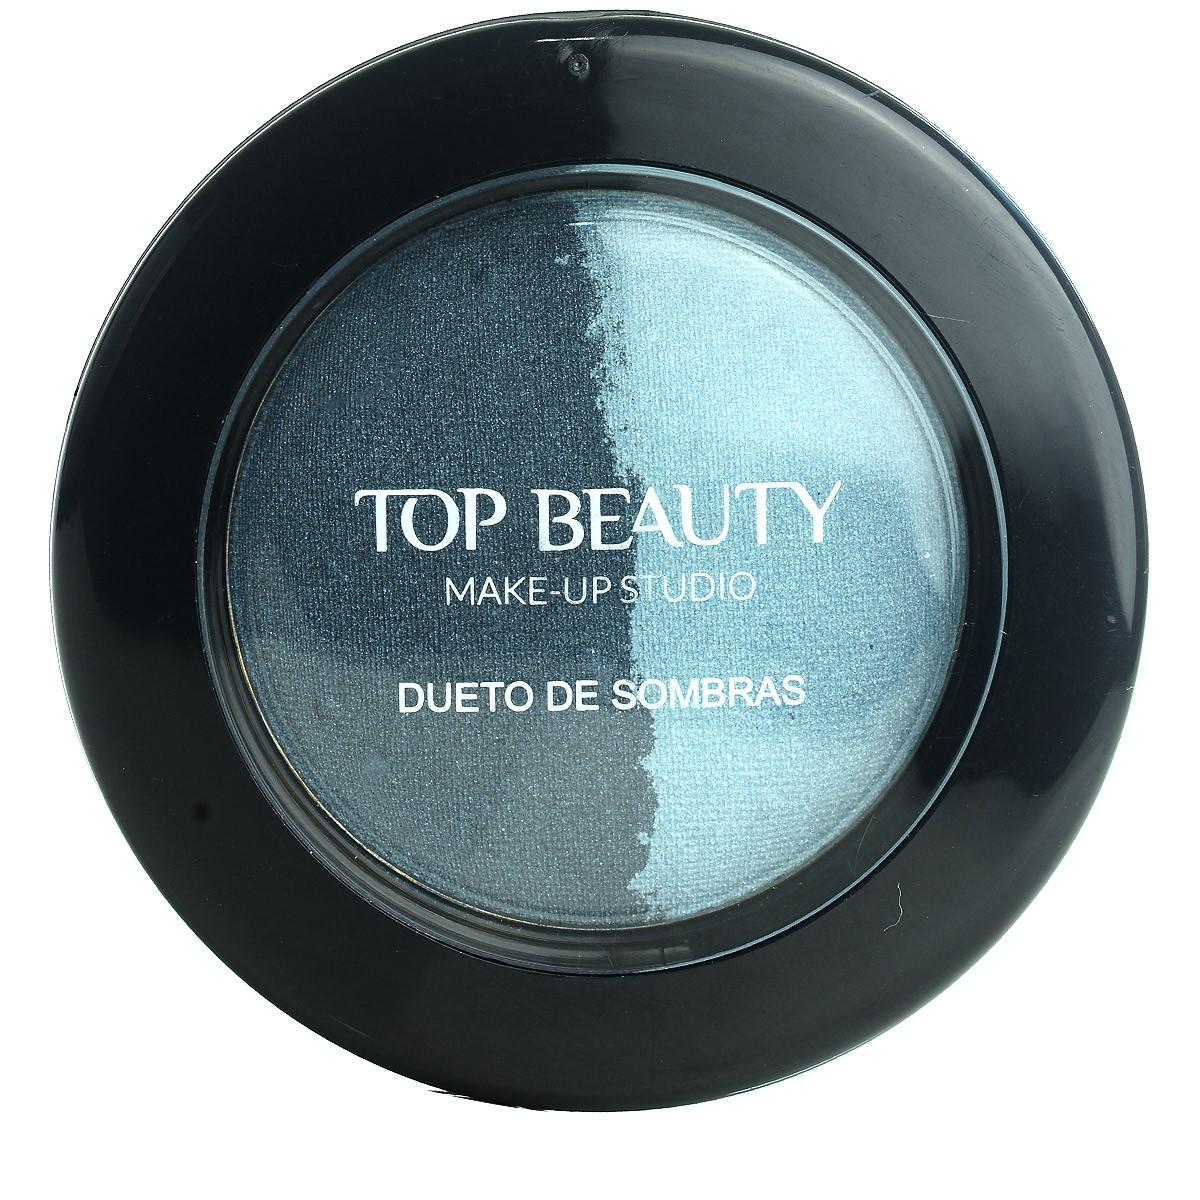 Dueto de Sombras 01 Top Beauty 4,5g